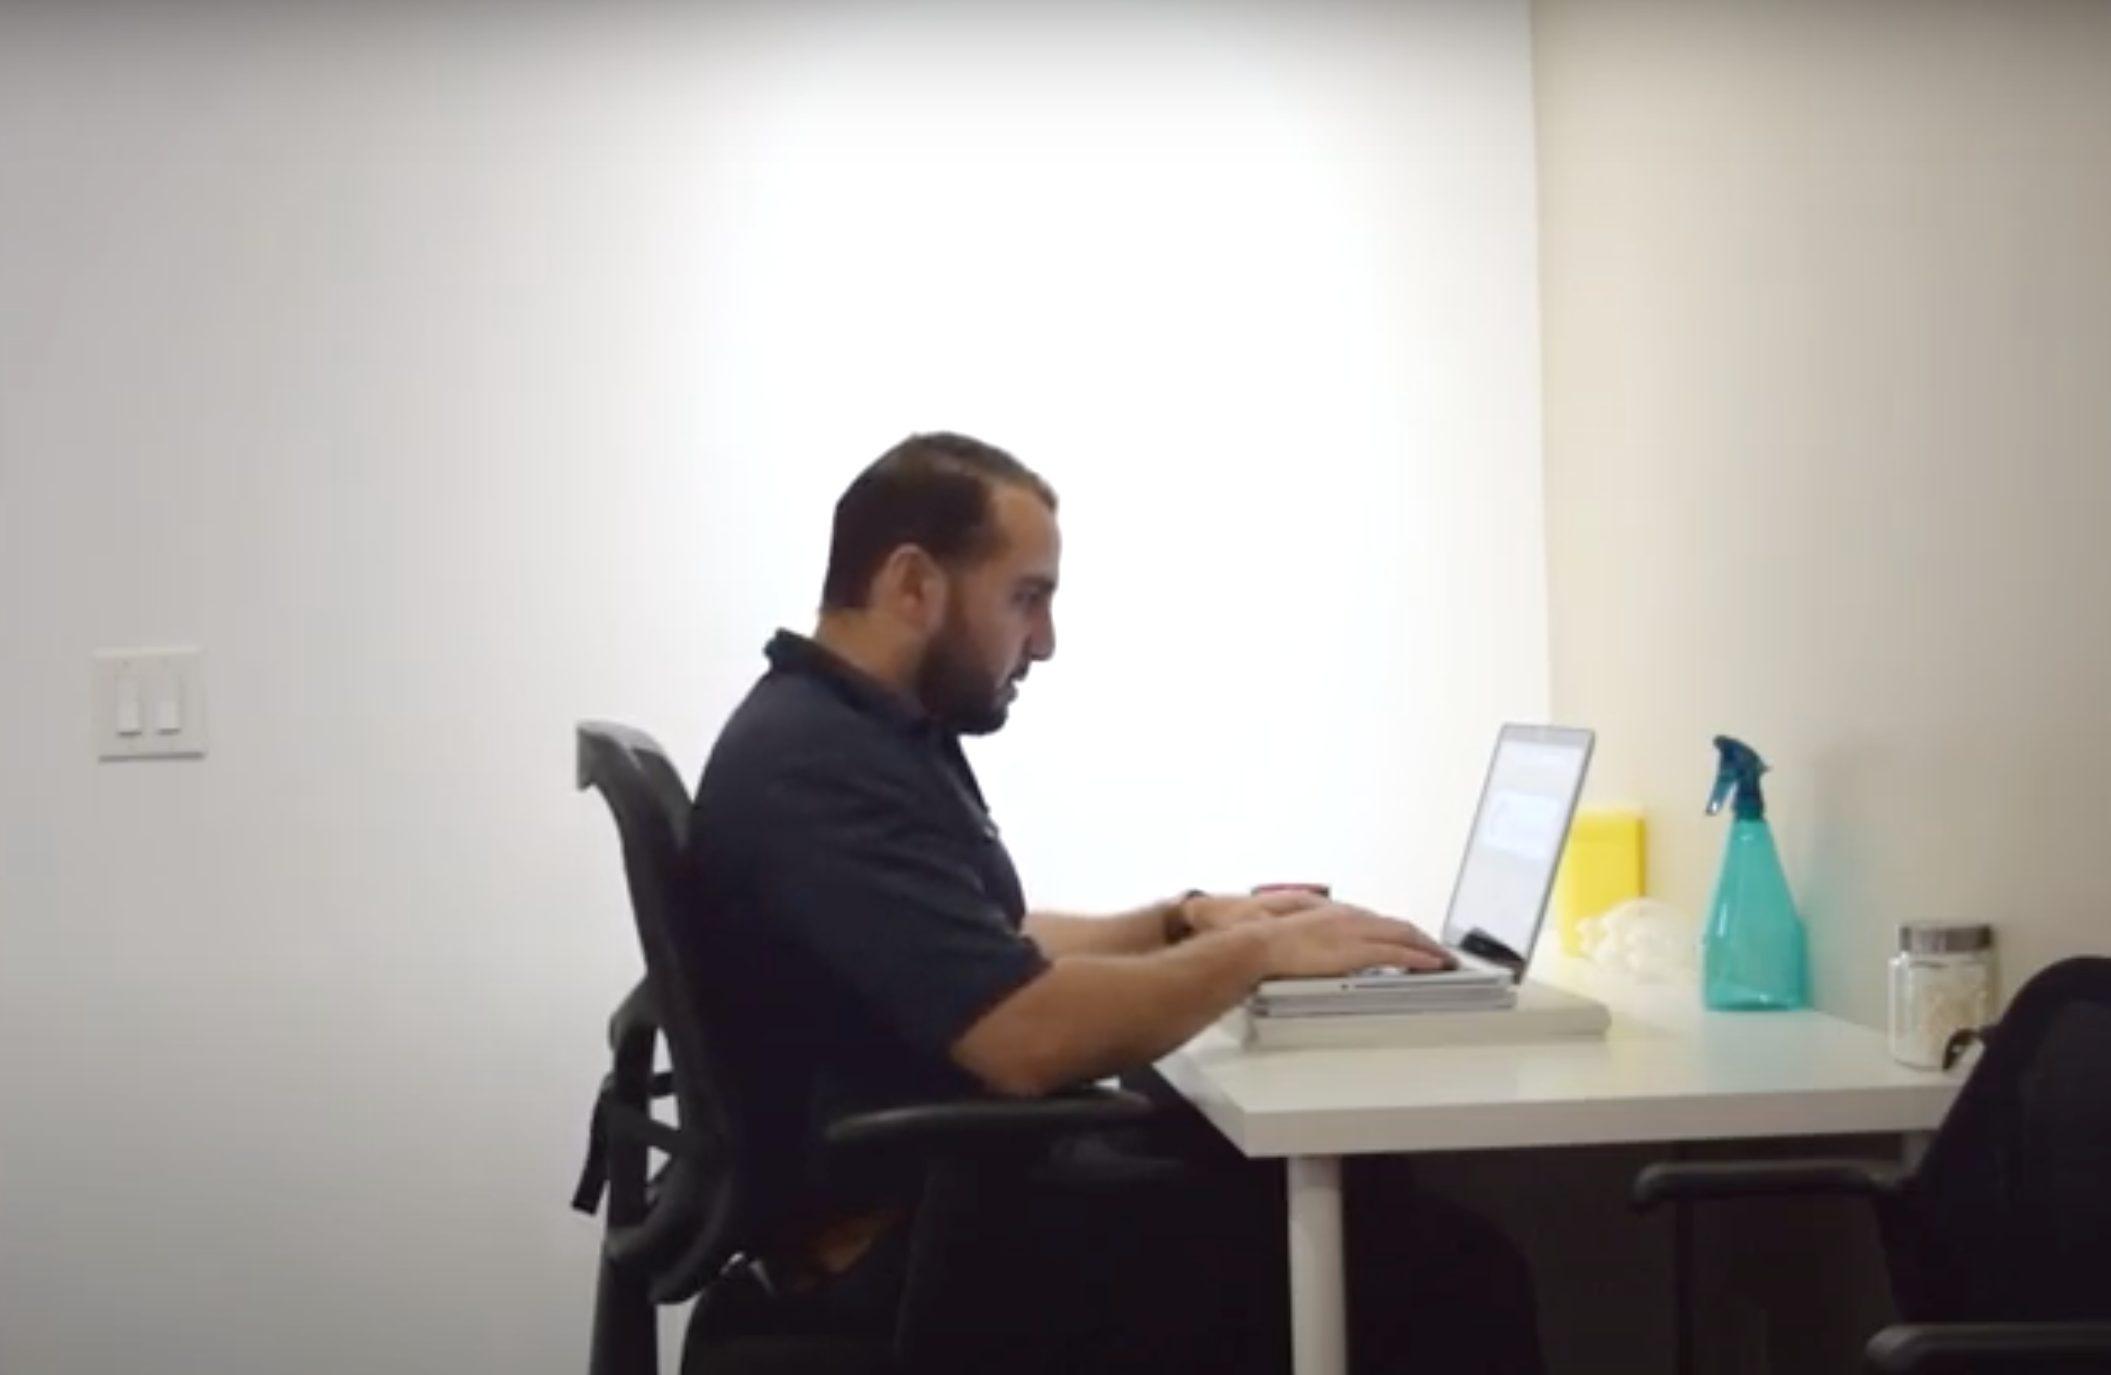 Ergonomic Desk